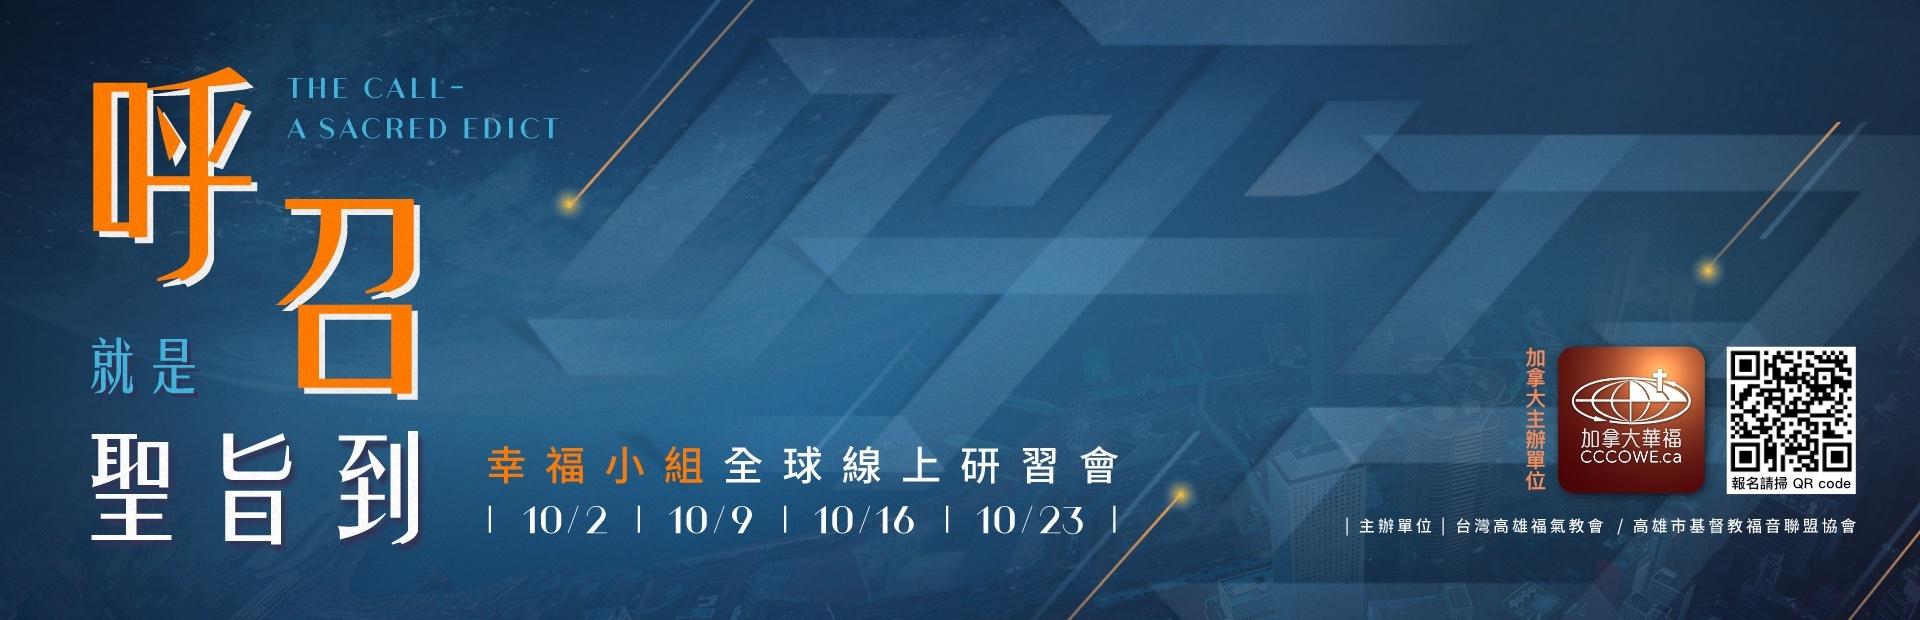 HGGOC2021-Banner.jpg